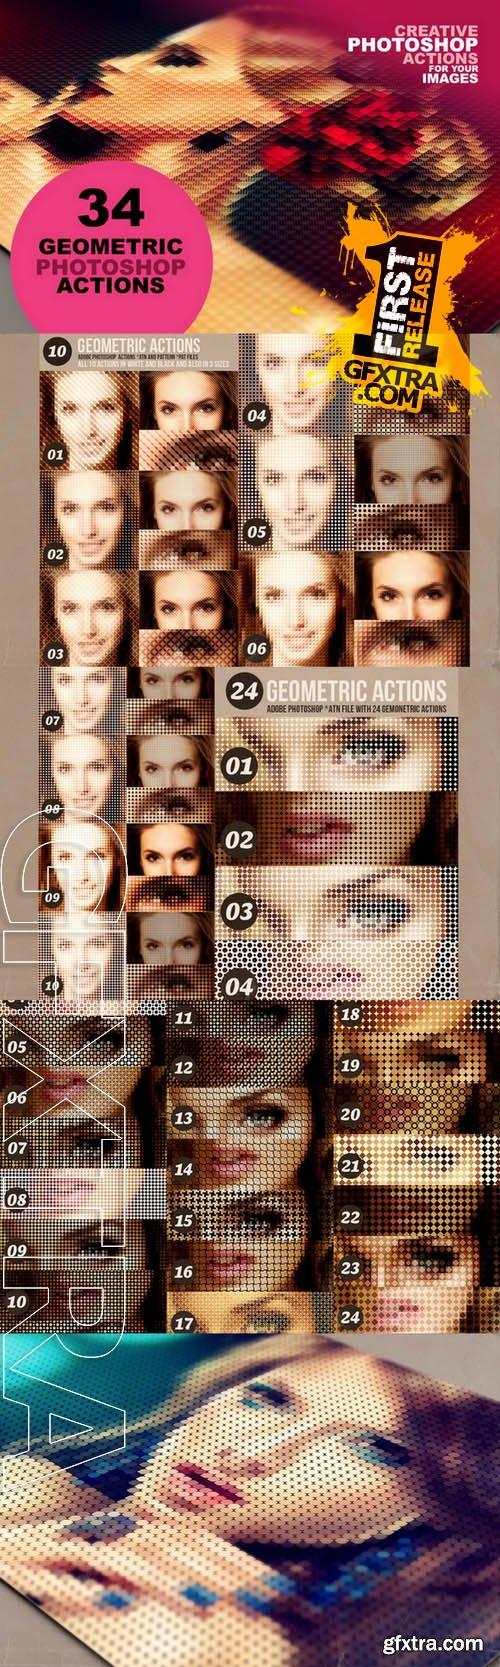 34 Geometric Photoshop Actions 03 - Creativemarket 29491